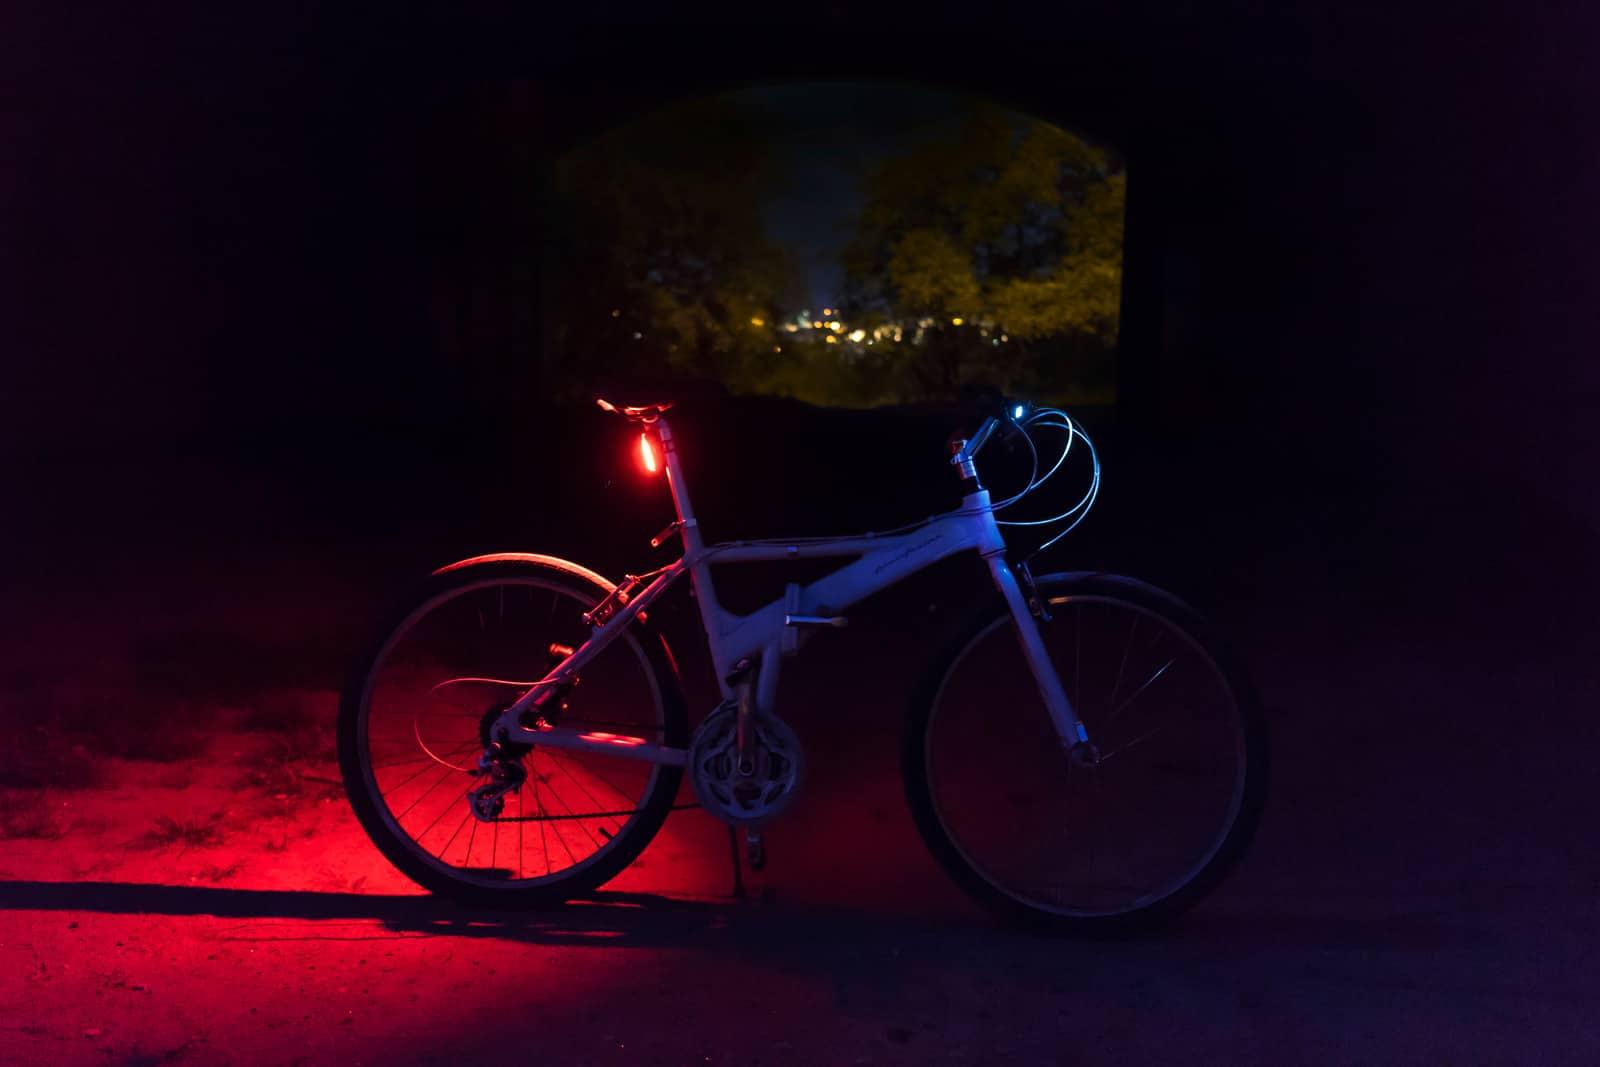 bike wheel lights at night